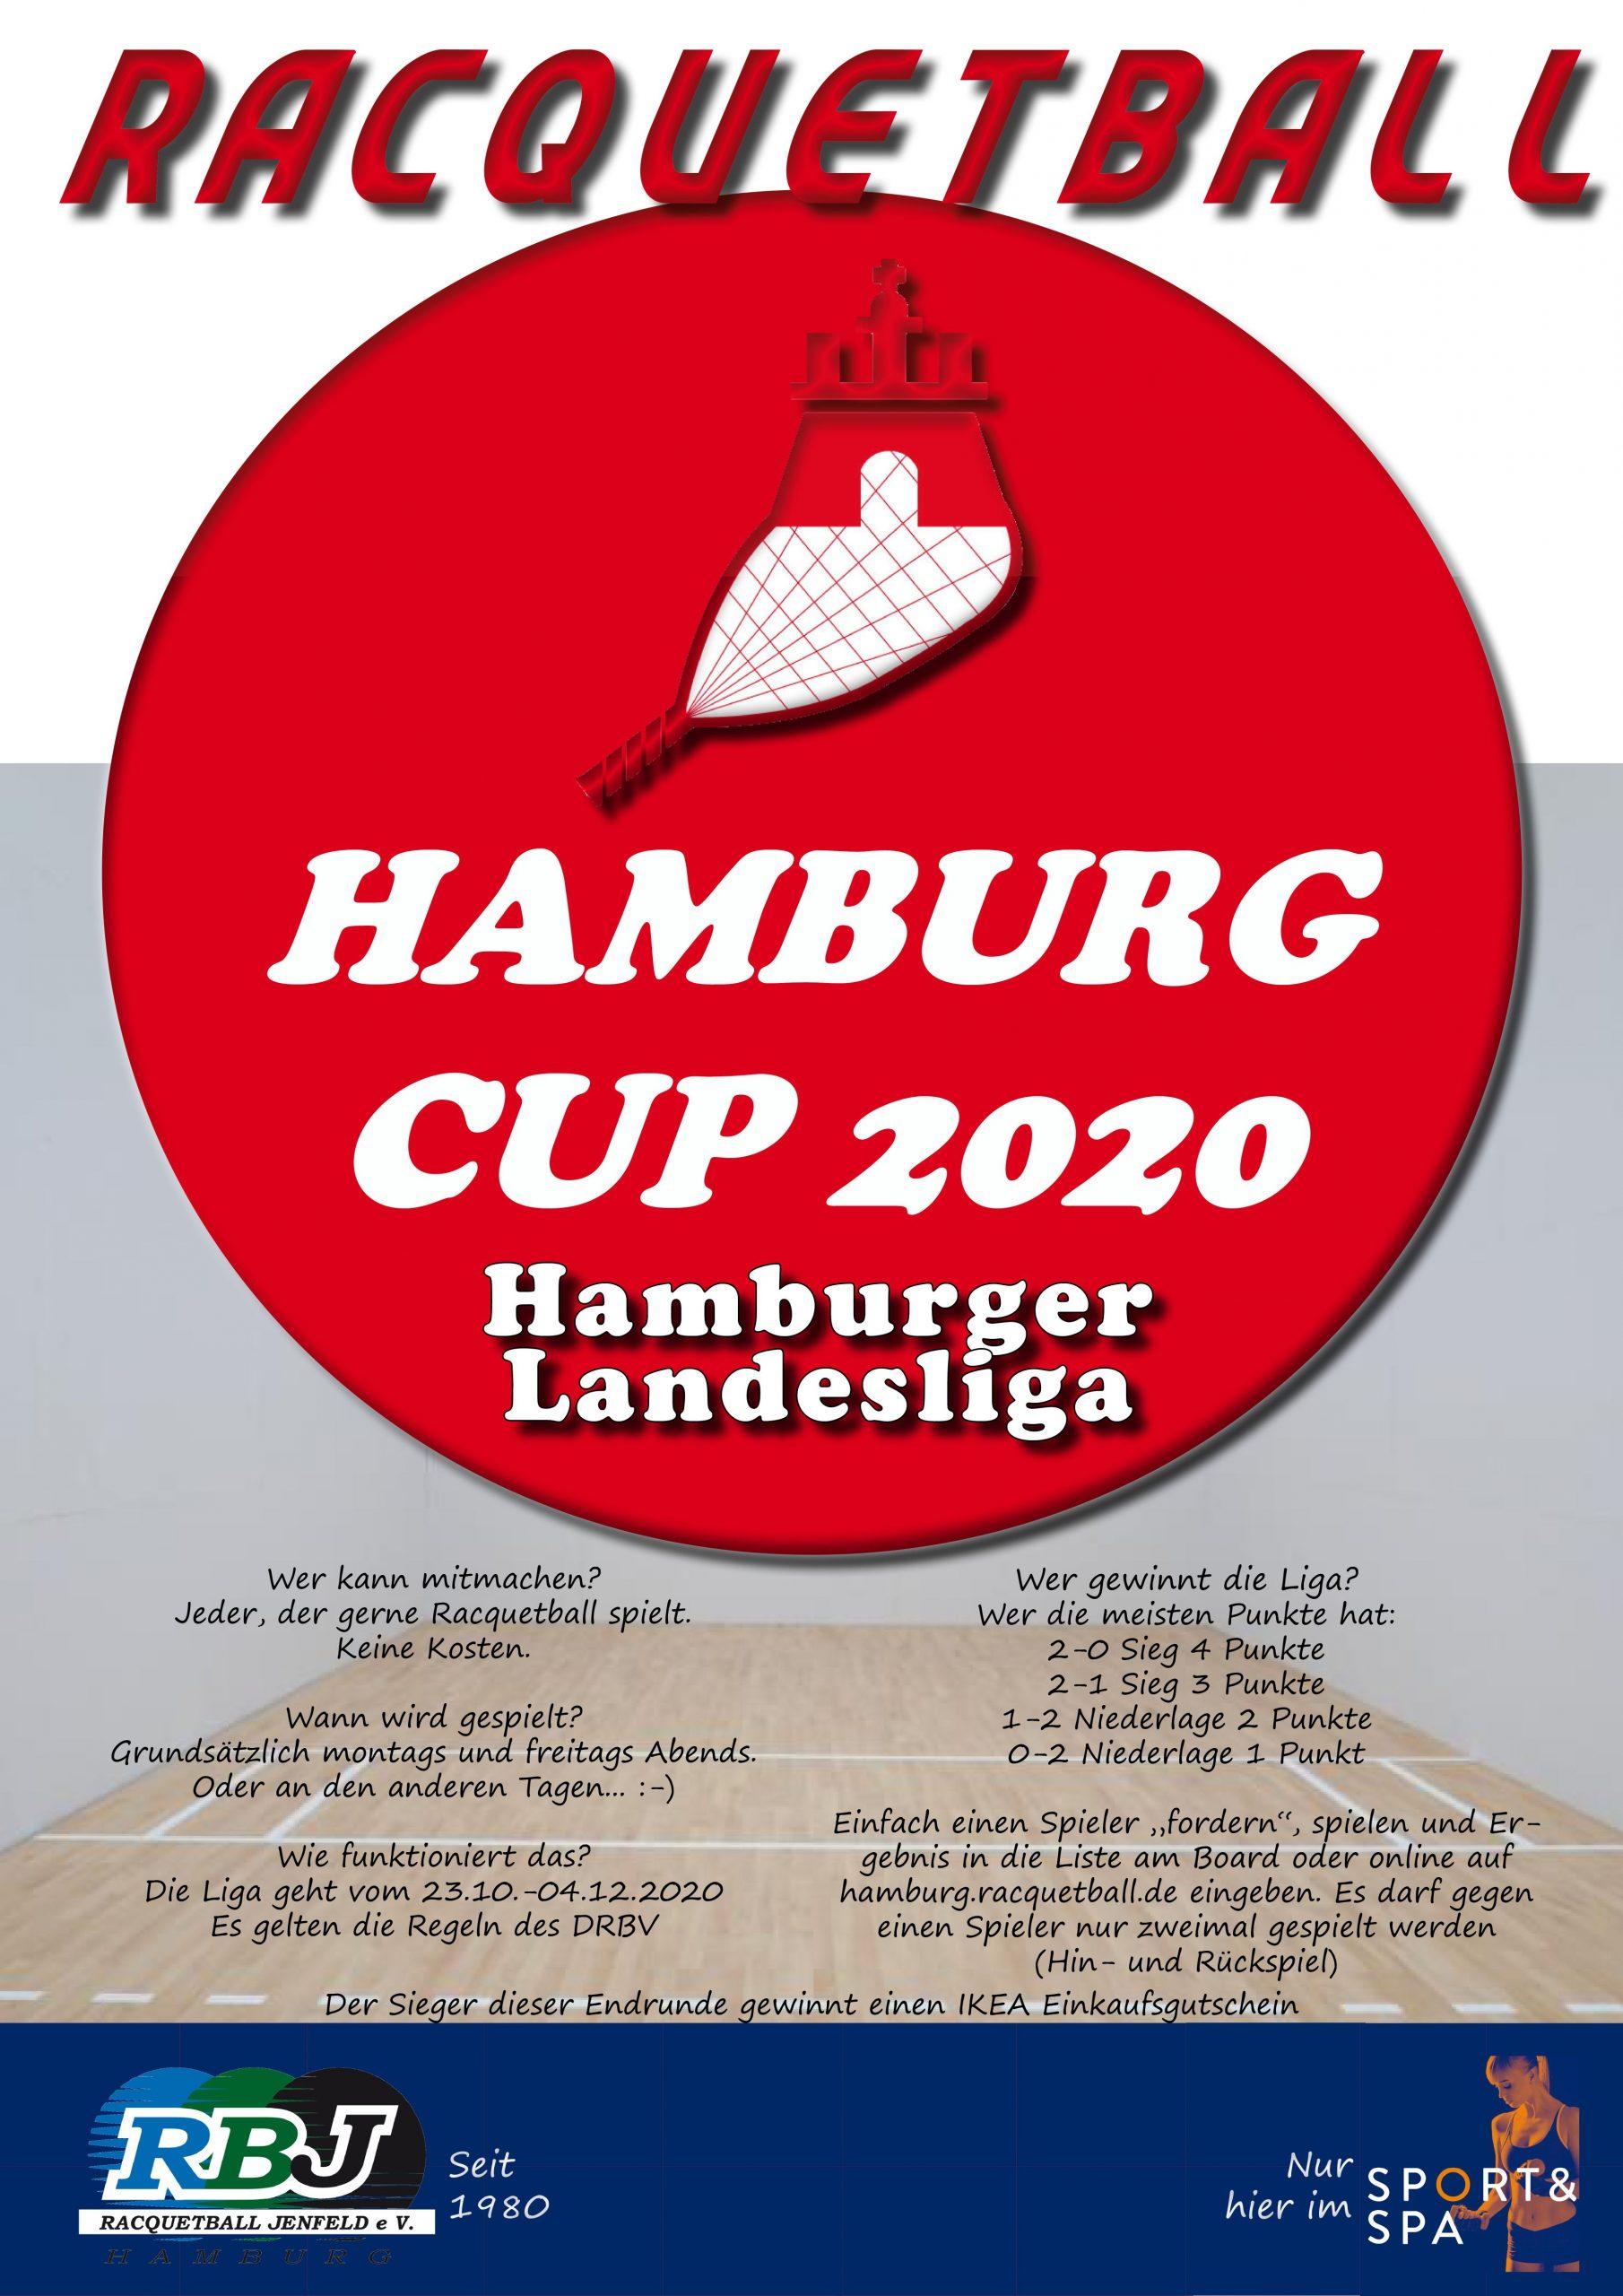 Landesliga 2020 startet am 23.10.